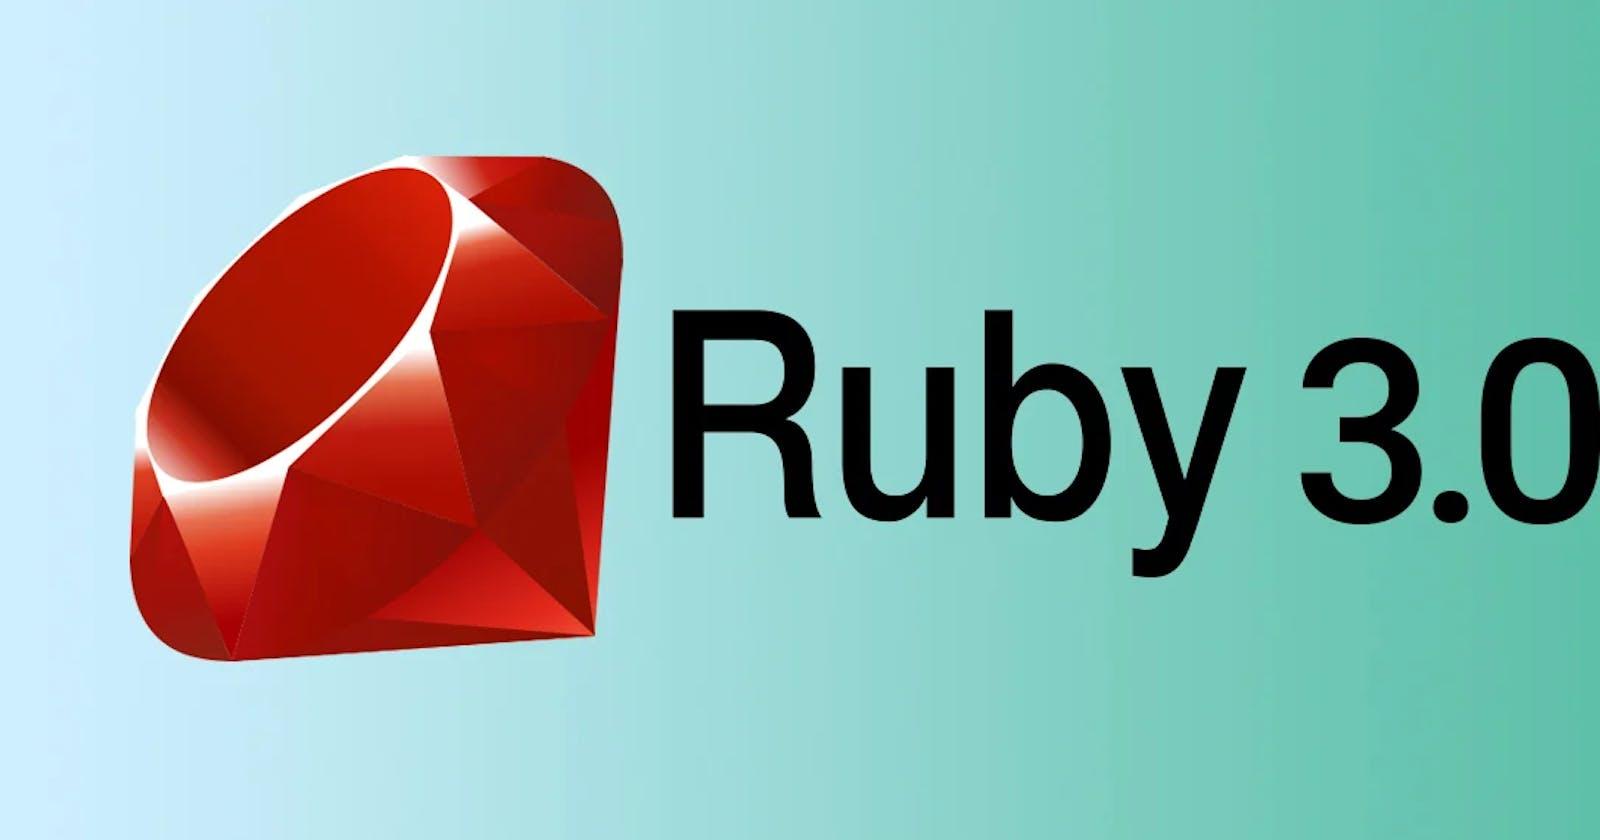 Setting up Ruby 3.0.0 on Windows 10 or WSL2 Ubuntu (updated)